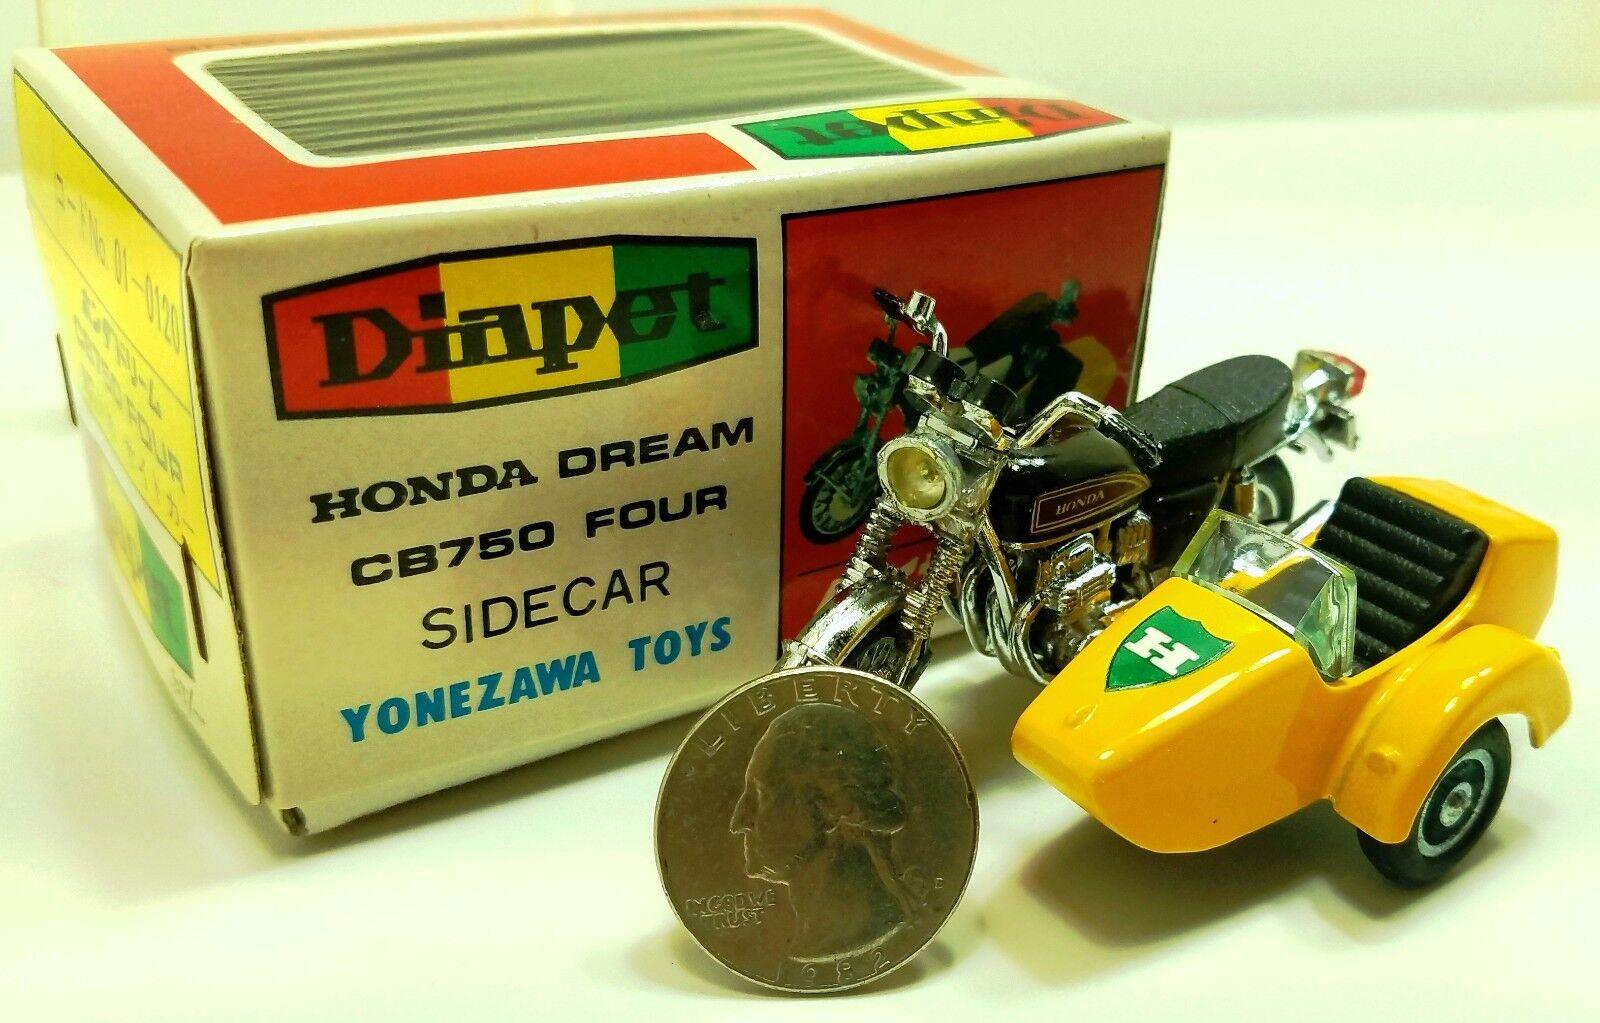 Vintage YONEZAWA toys-DIAPET HONDA 1 30 CB750 Moto avec side-car